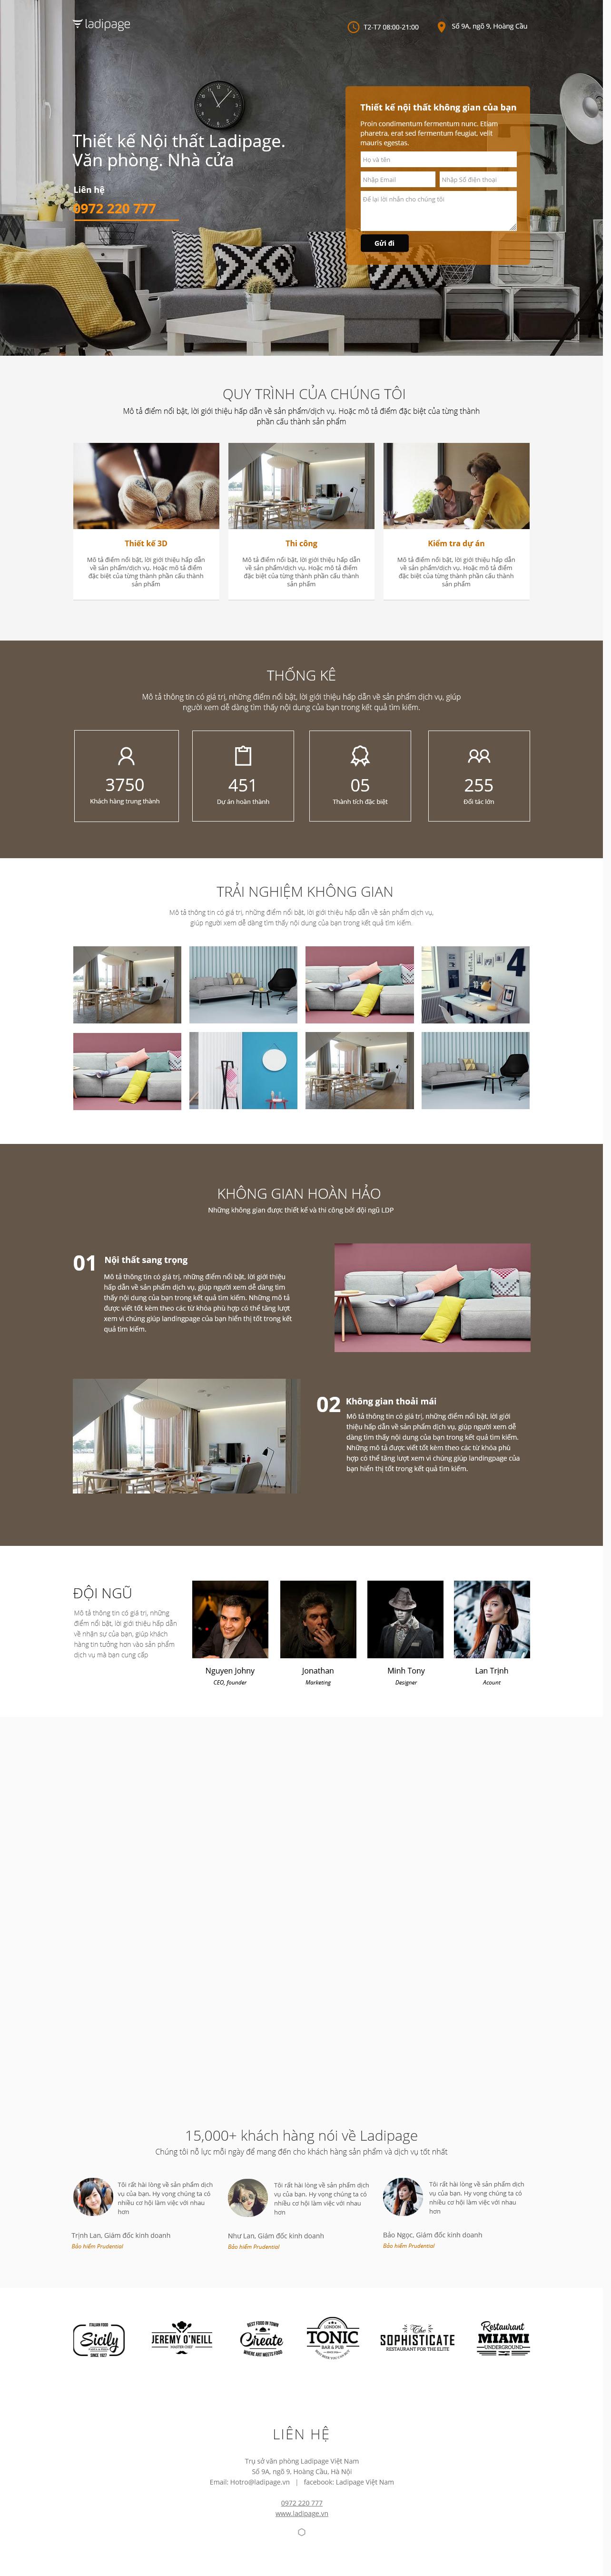 Thiết kế website Thiết kế webiste landingpage noi-that---ngoai-that Thiết kế nội thất 03